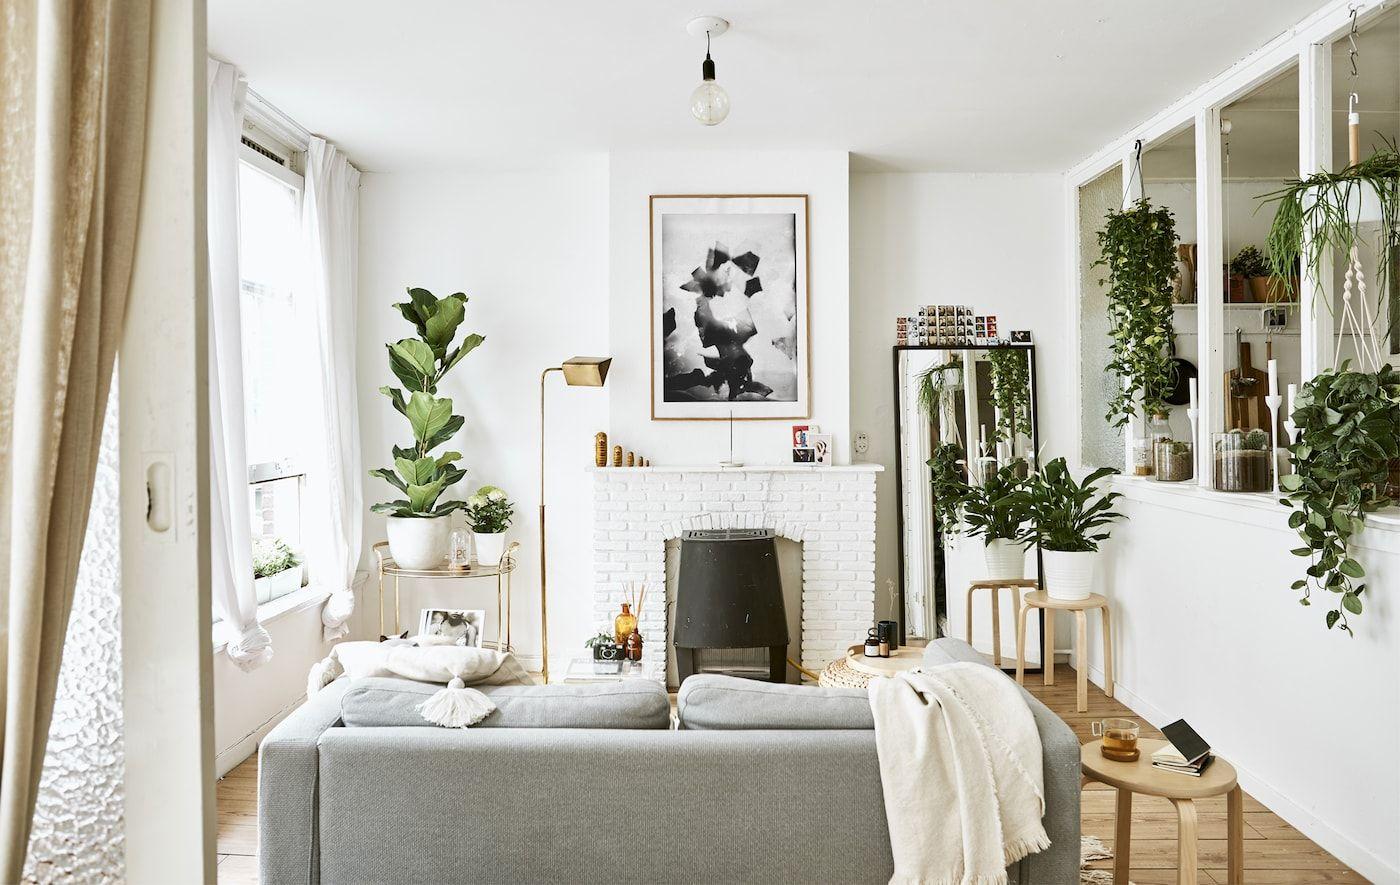 Wizyta W Miejskiej Kawalerce Ikea Small Spaces Small Spaces Minimalist Living Room Decor